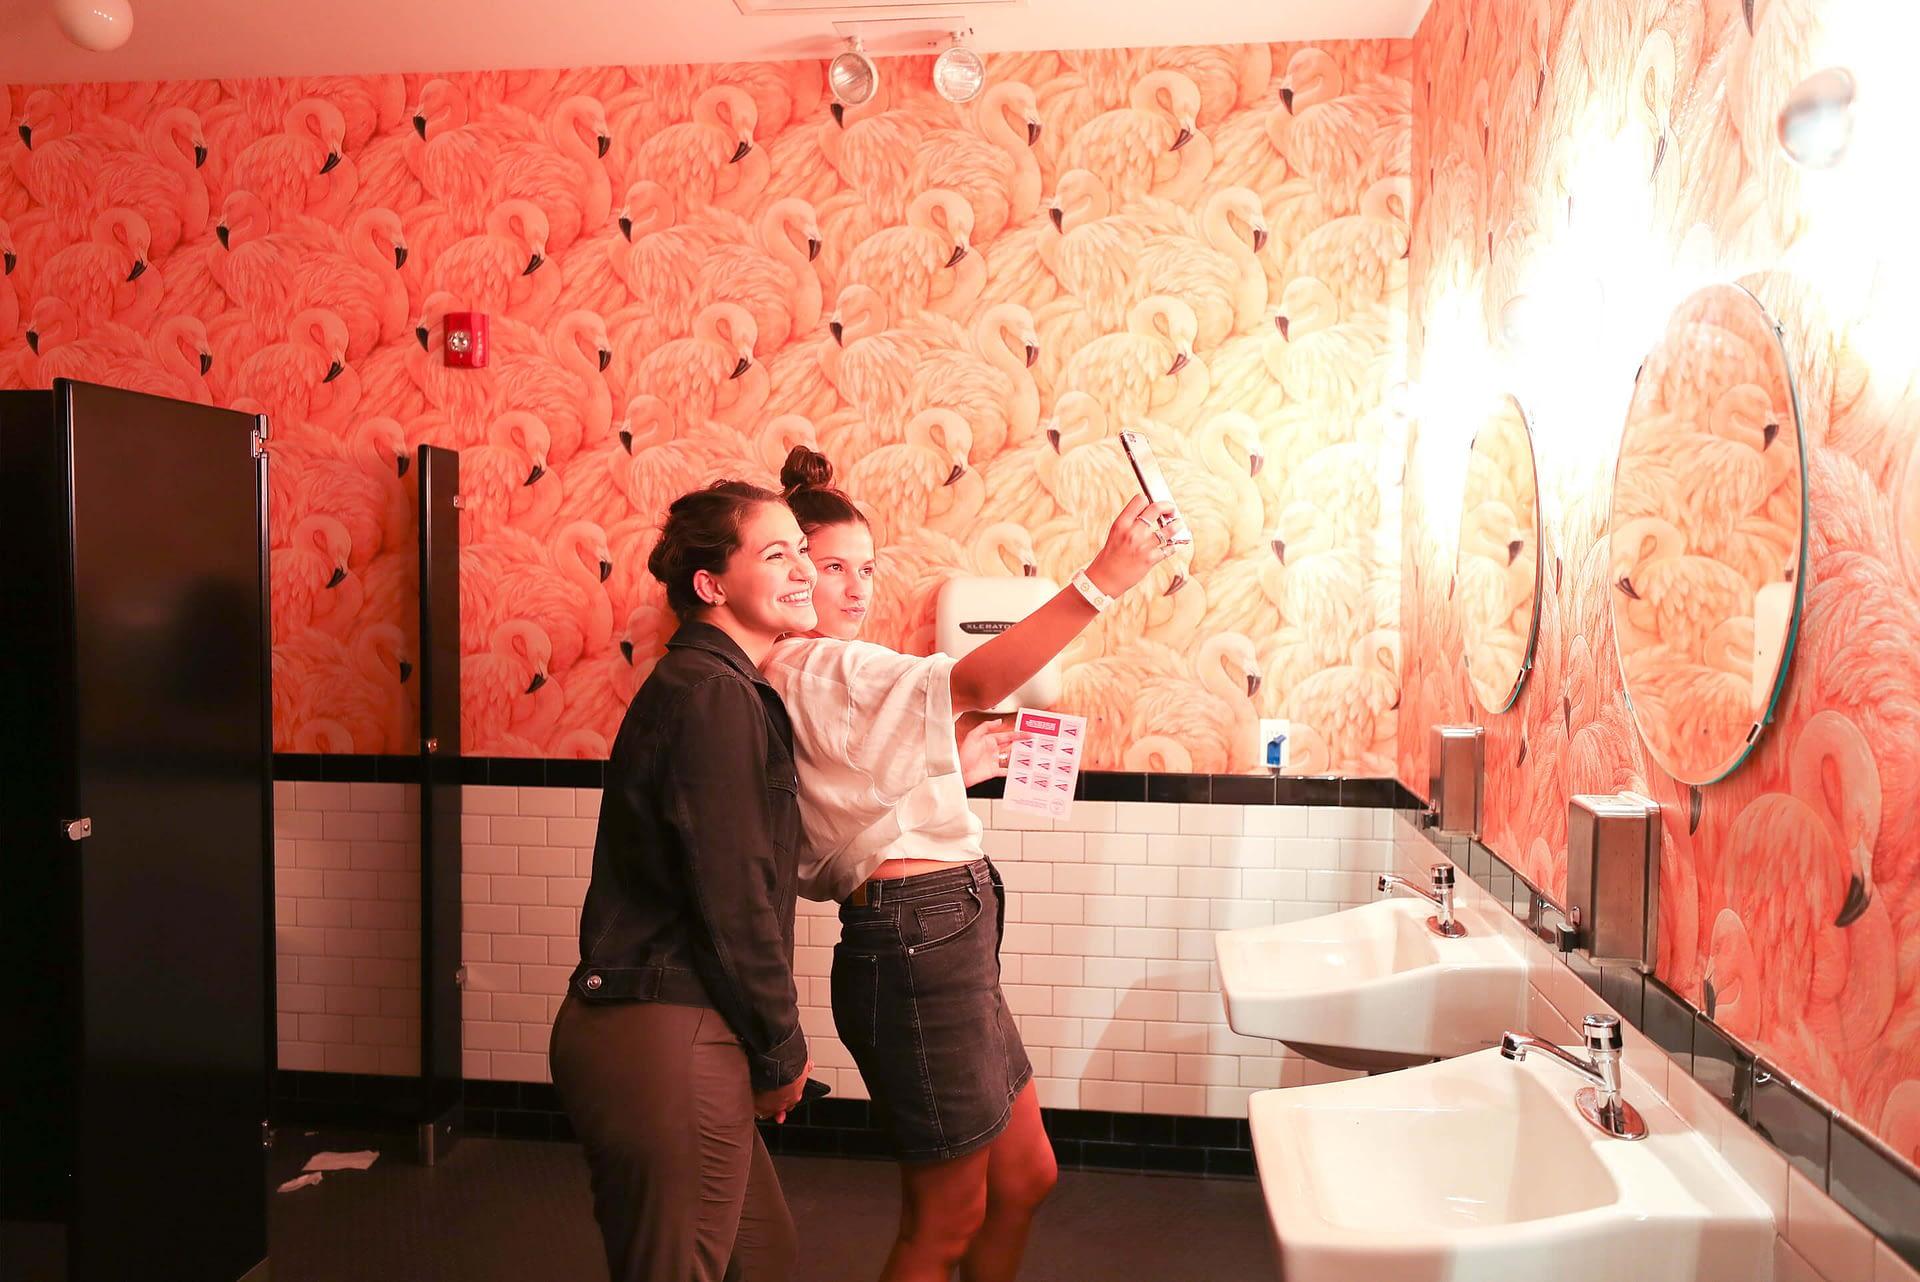 Sunshine Shuffle Flamingo Bathroom Selfie